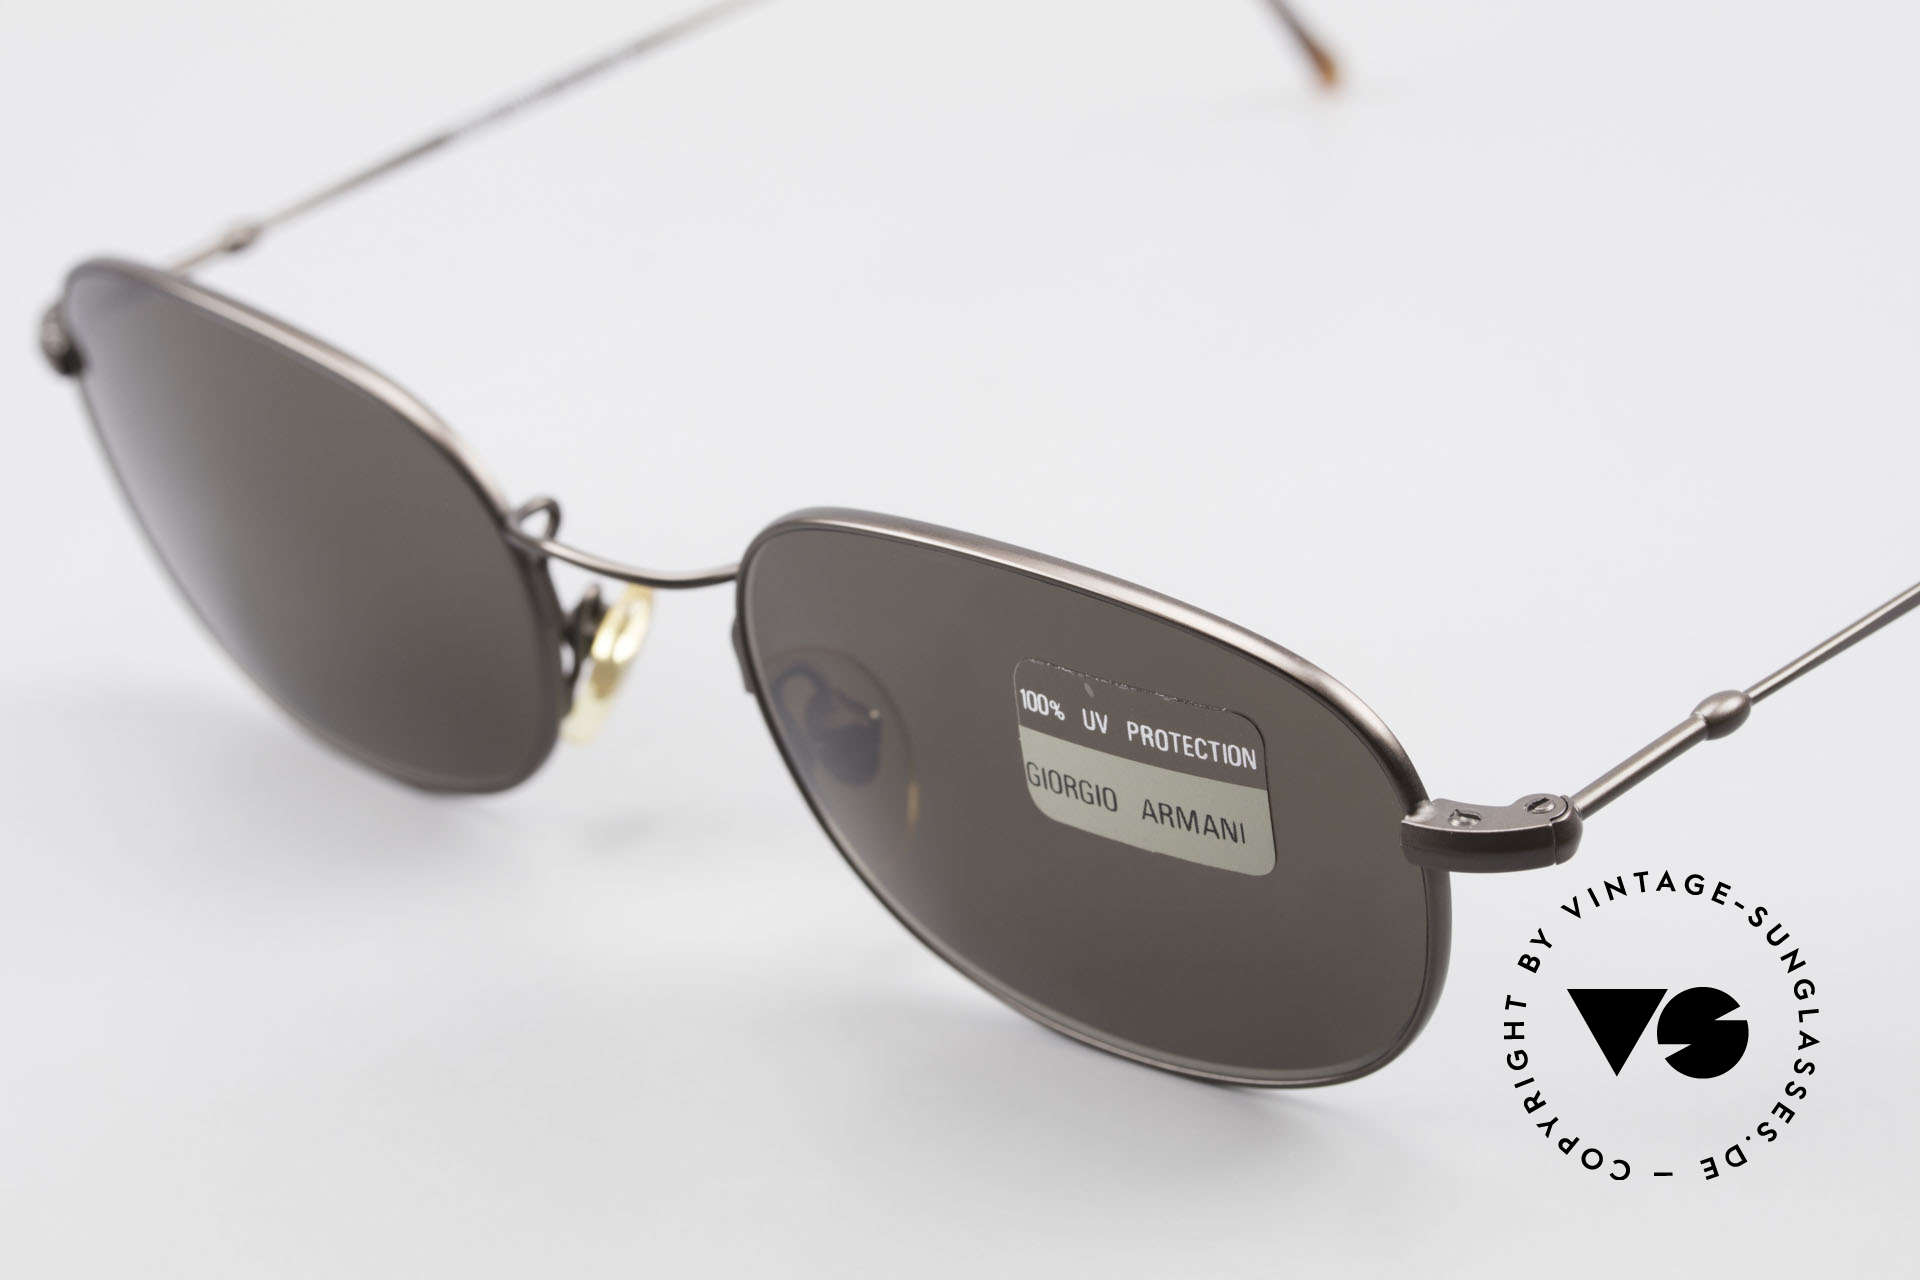 Giorgio Armani 234 Classic Designer Shades 80's, never worn (like all our 1980's designer classics), Made for Men and Women